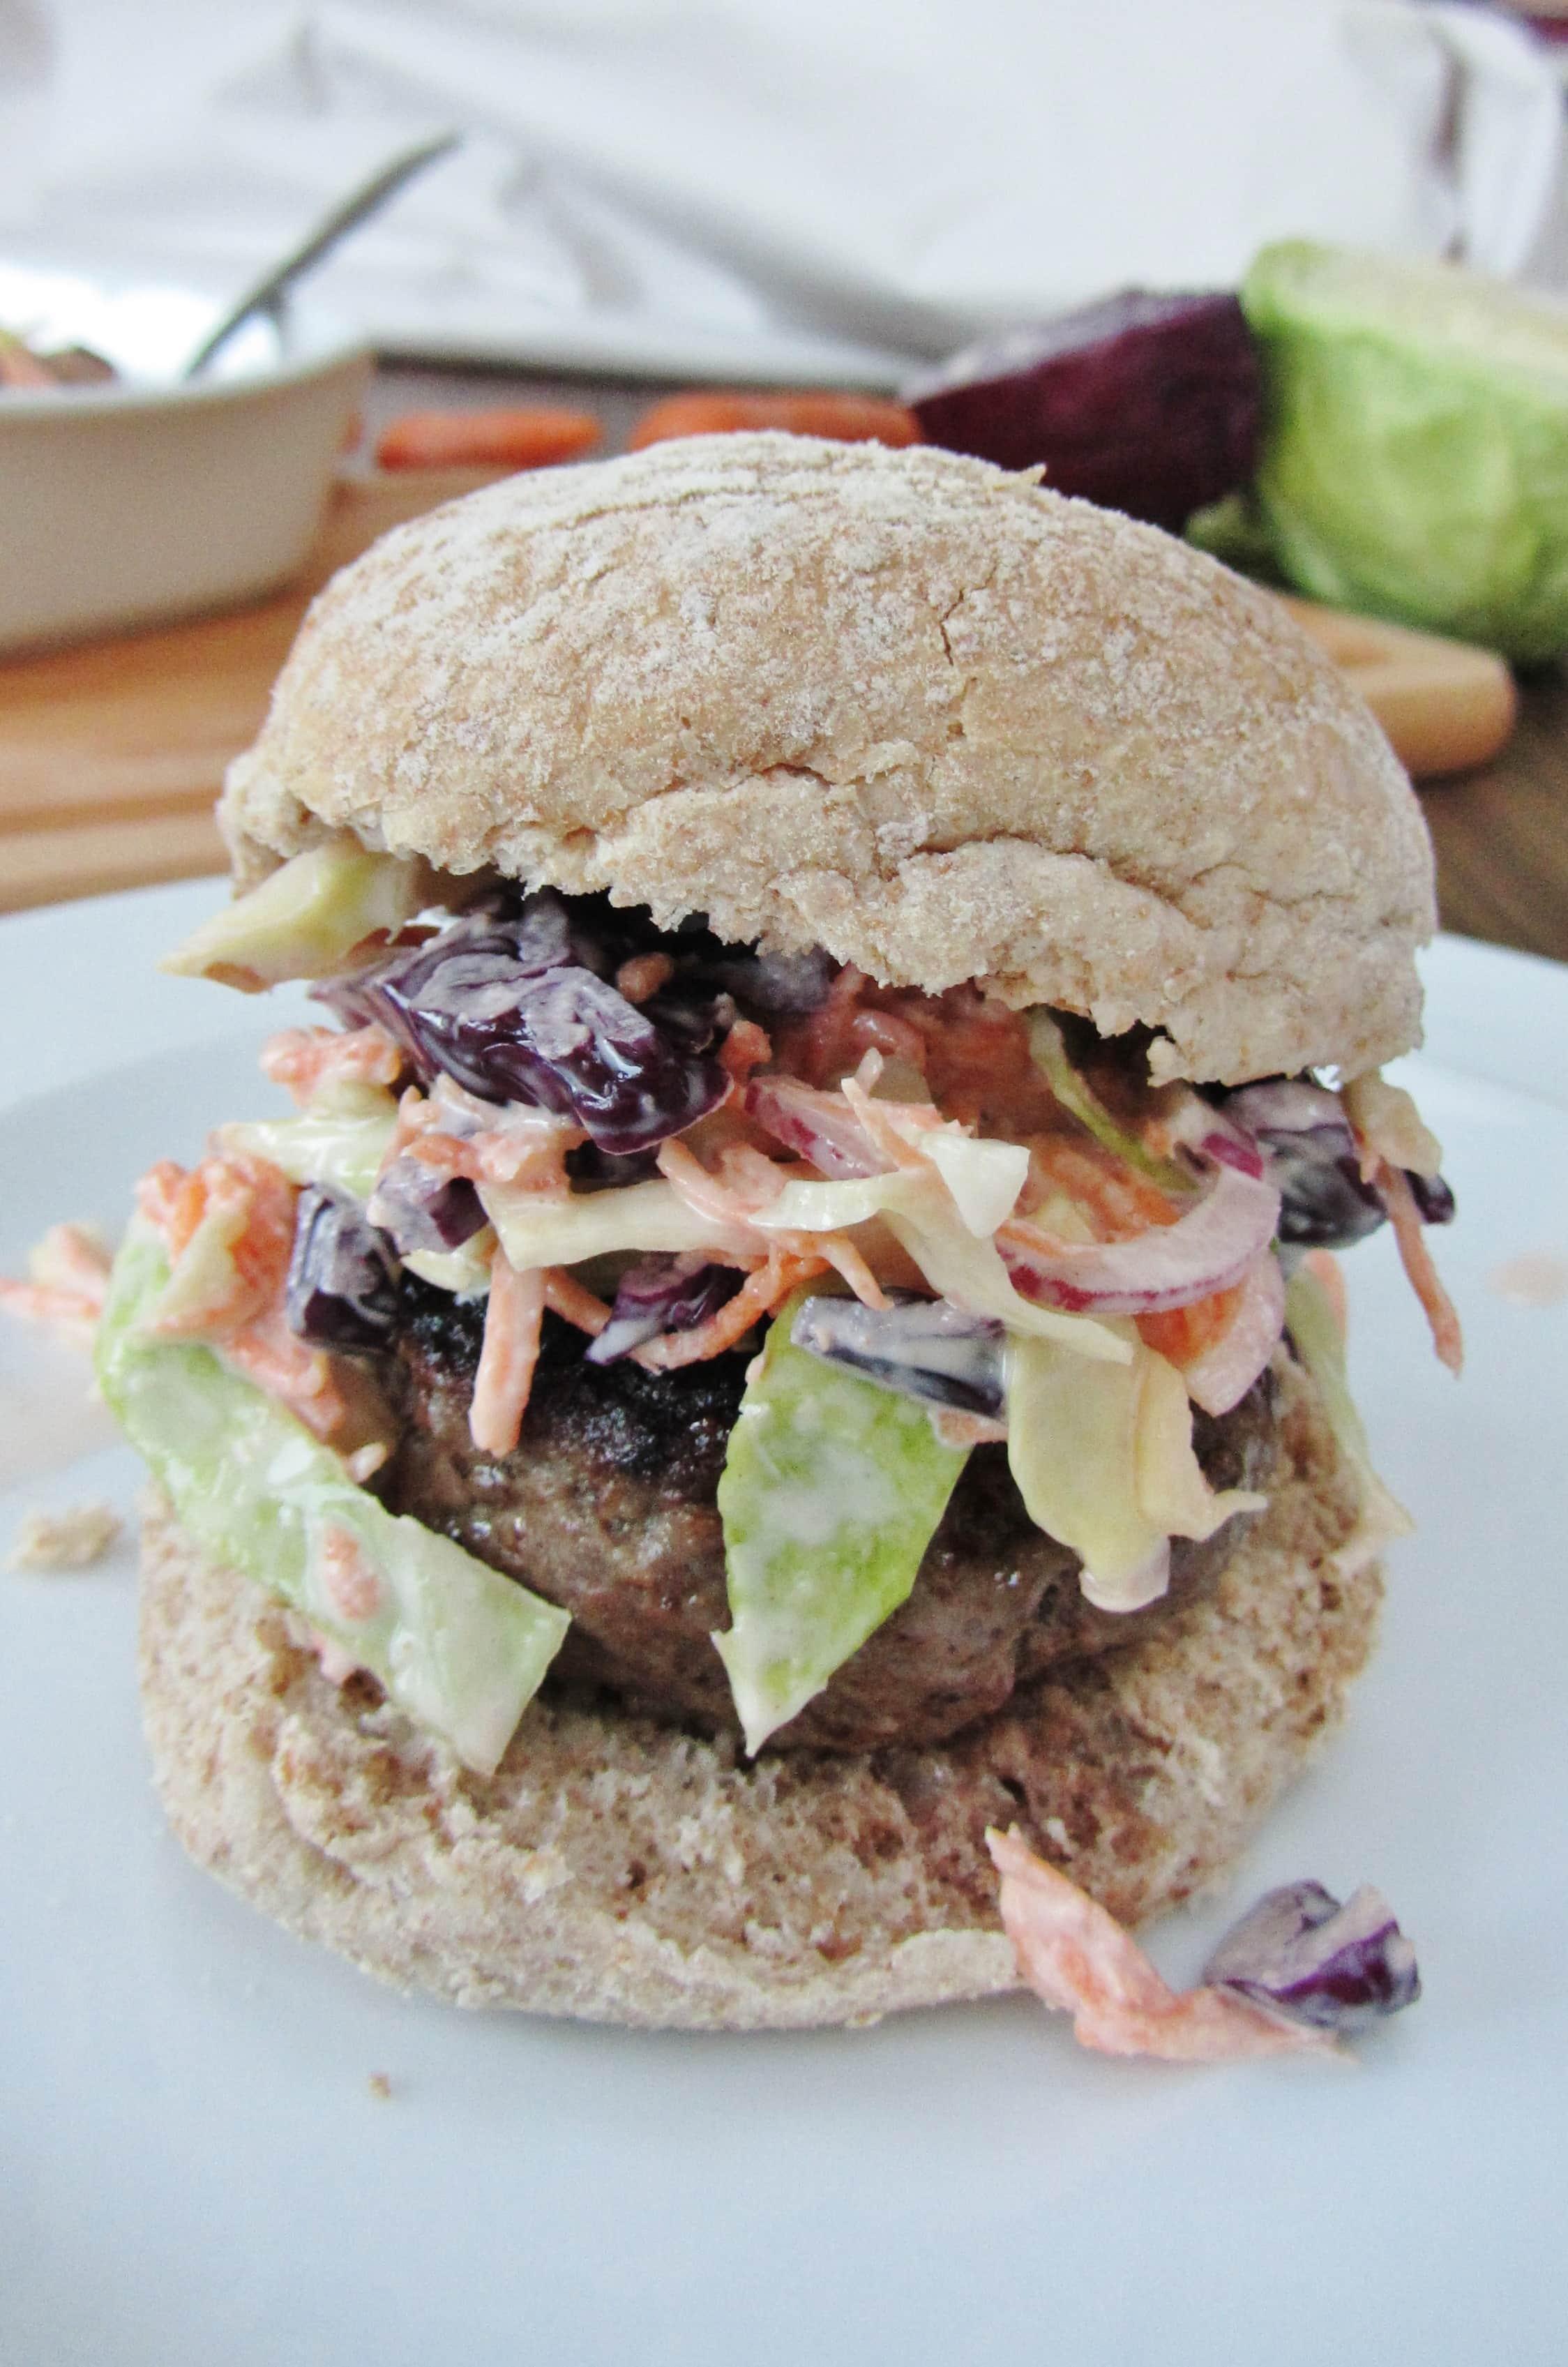 Homemade burger with char siu coleslaw